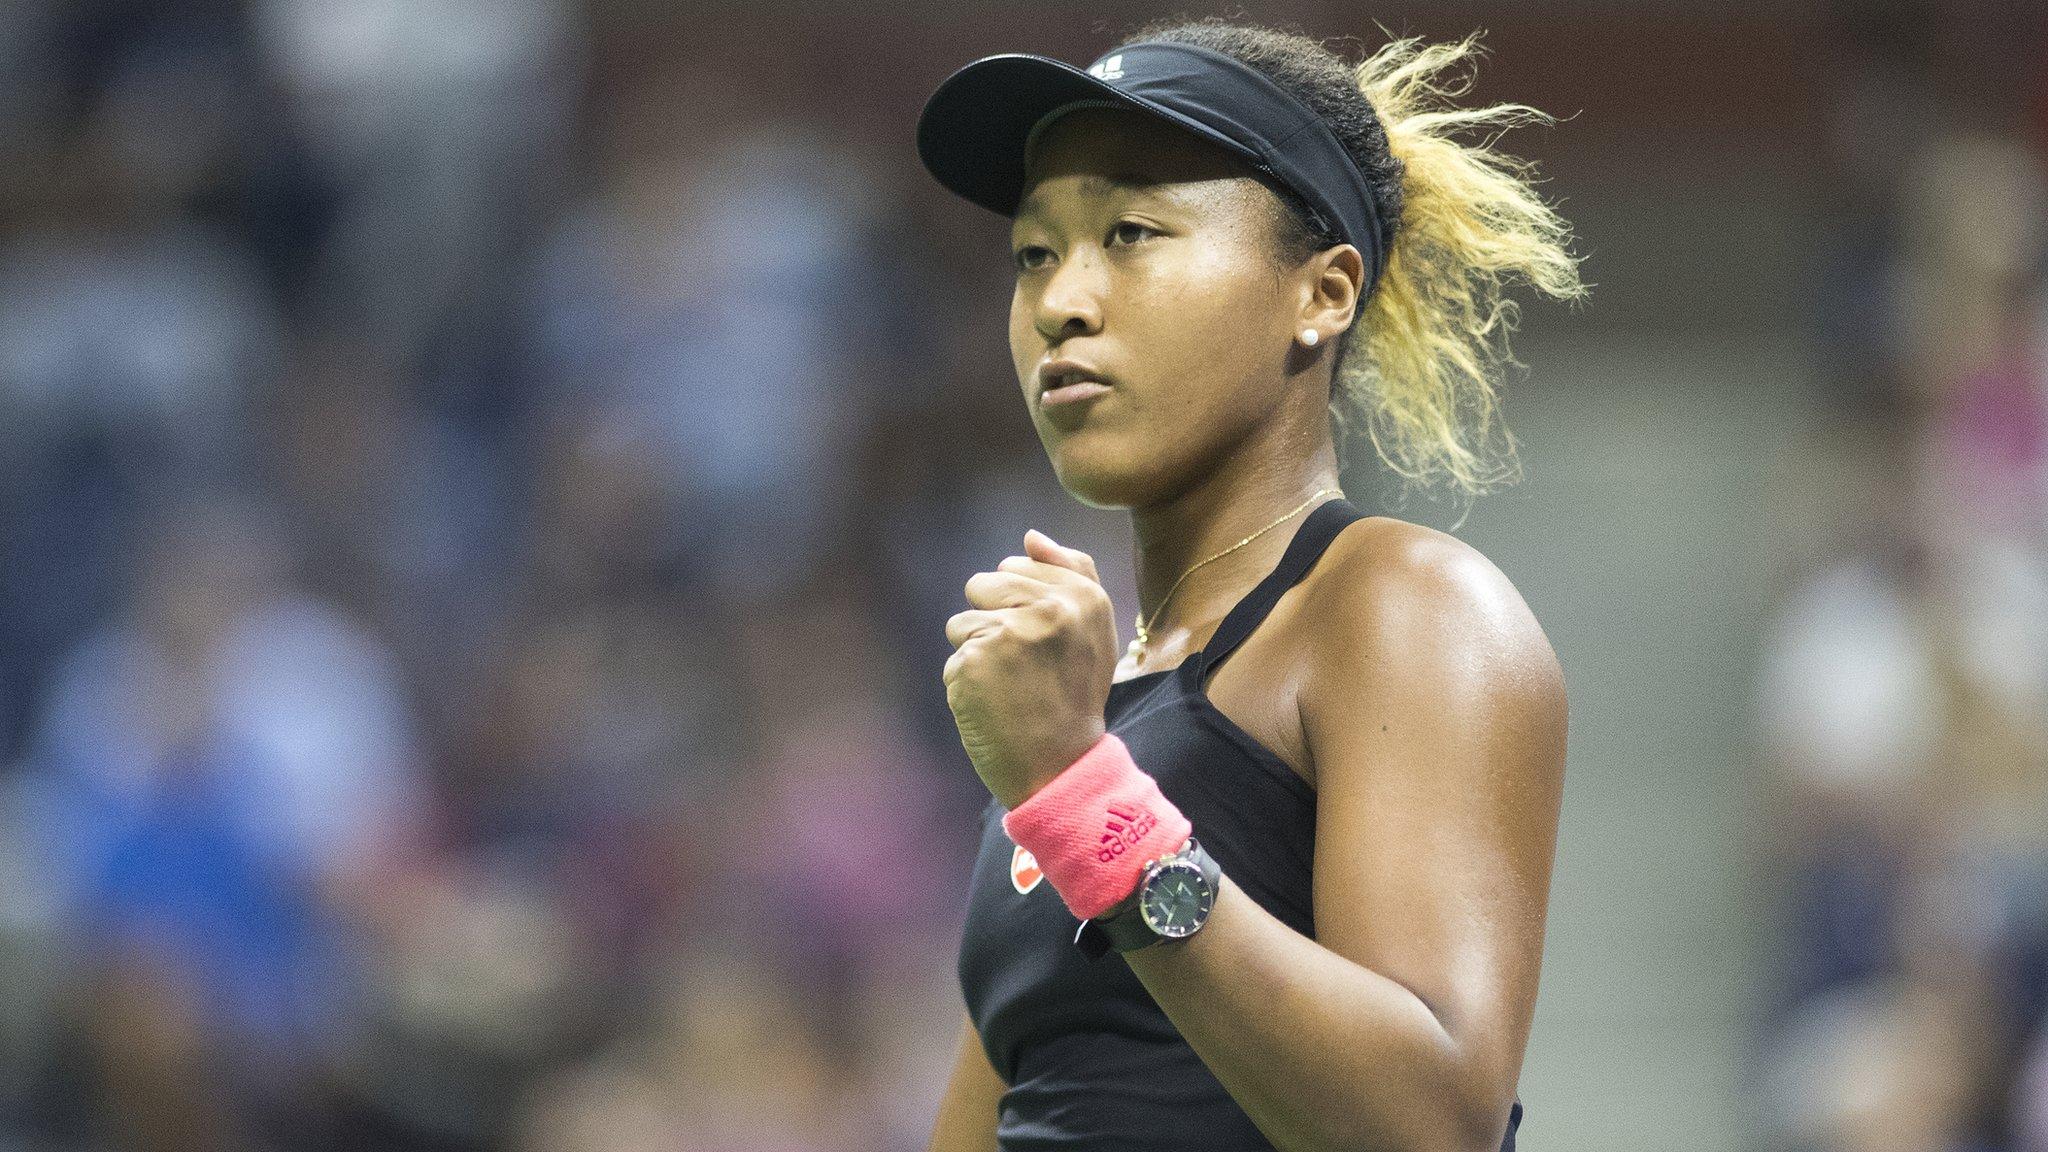 Naomi Osaka beats Dominika Cibulkova in straight sets at Pan Pacific Open